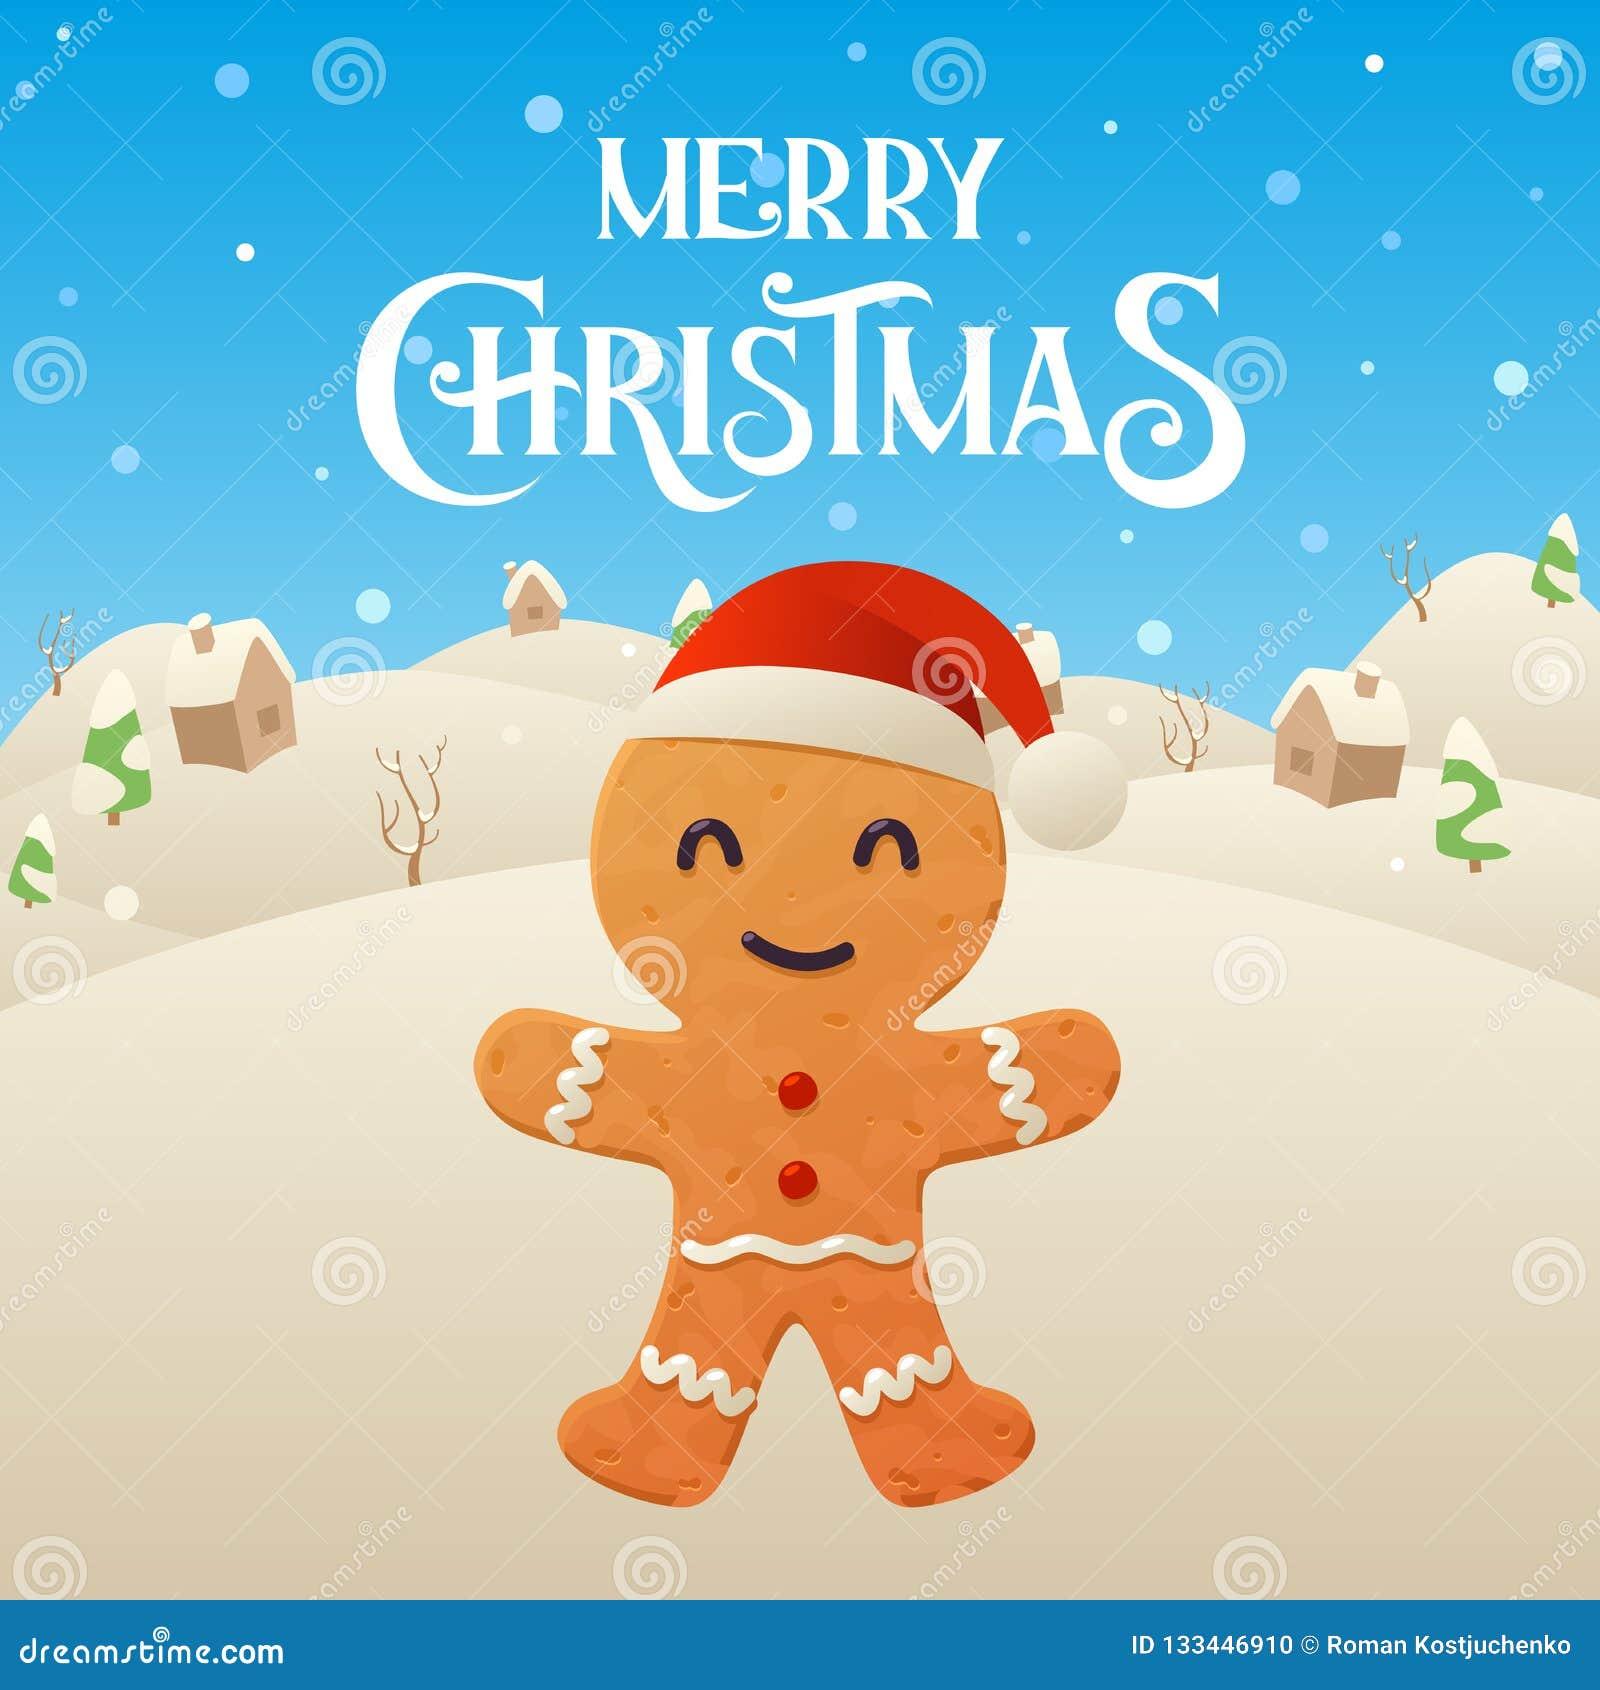 Cute Cartoon Gingerbread Character Merry Christmas